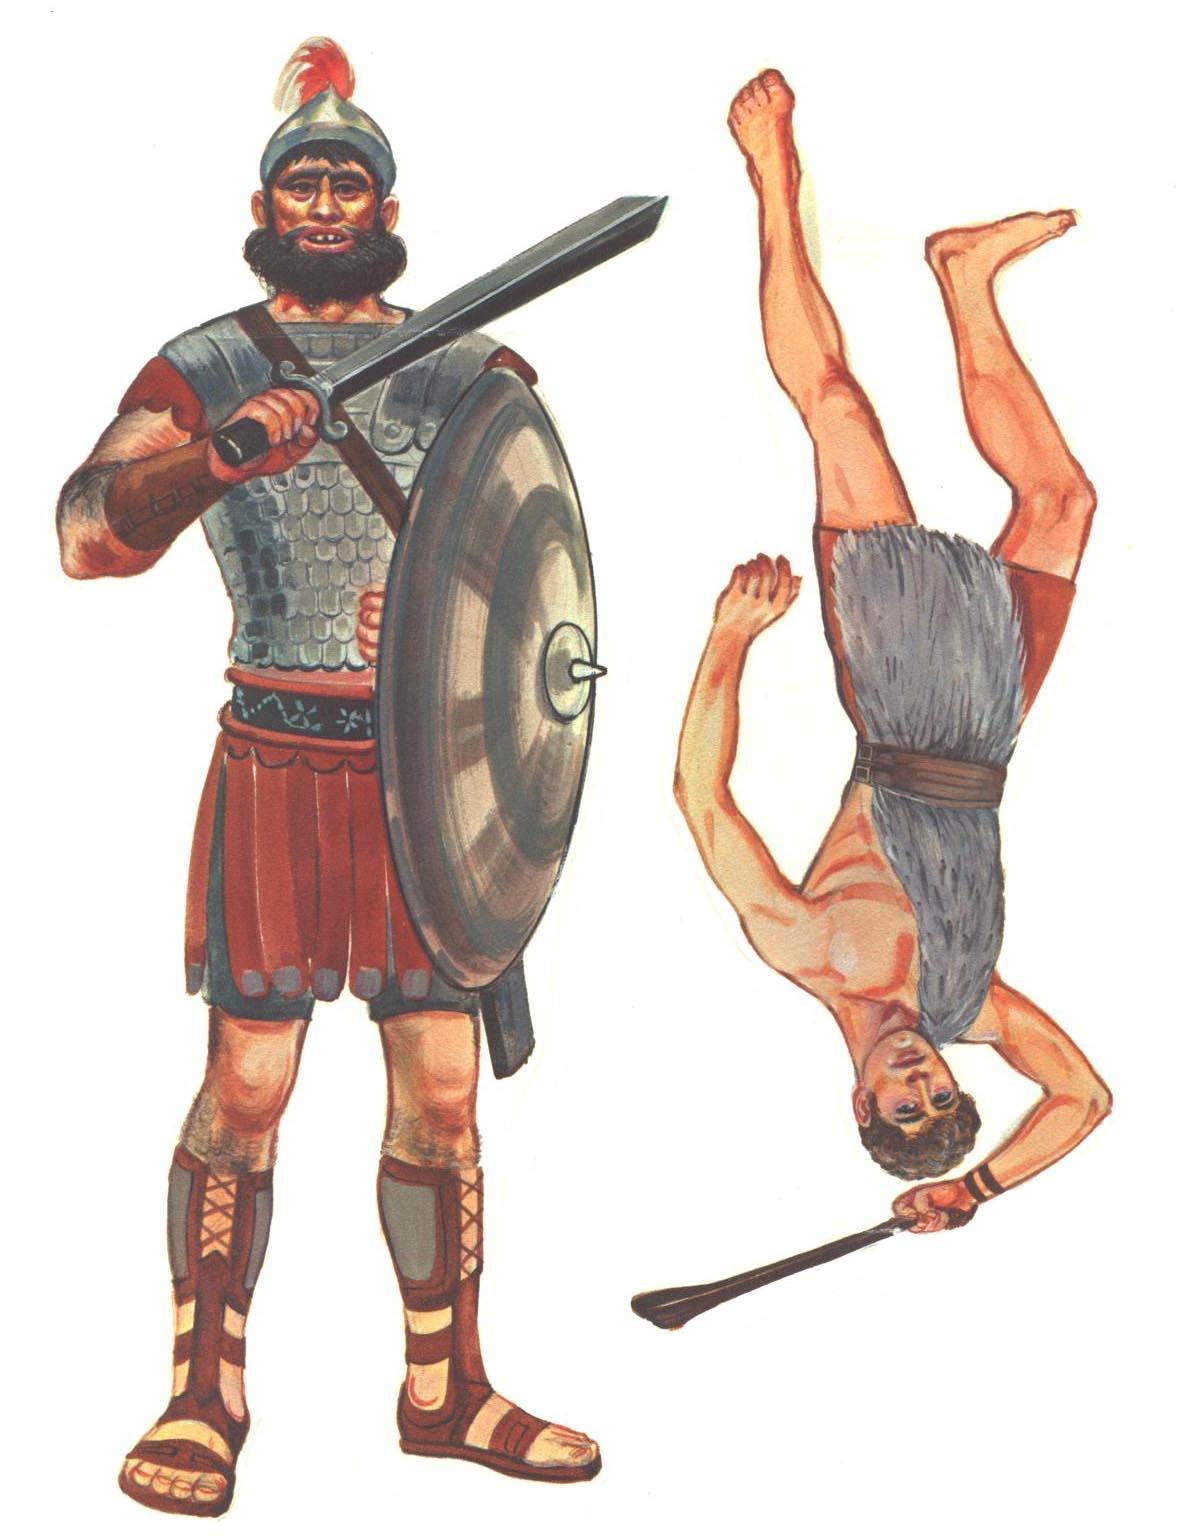 David And Goliath Preschool Craft And Games